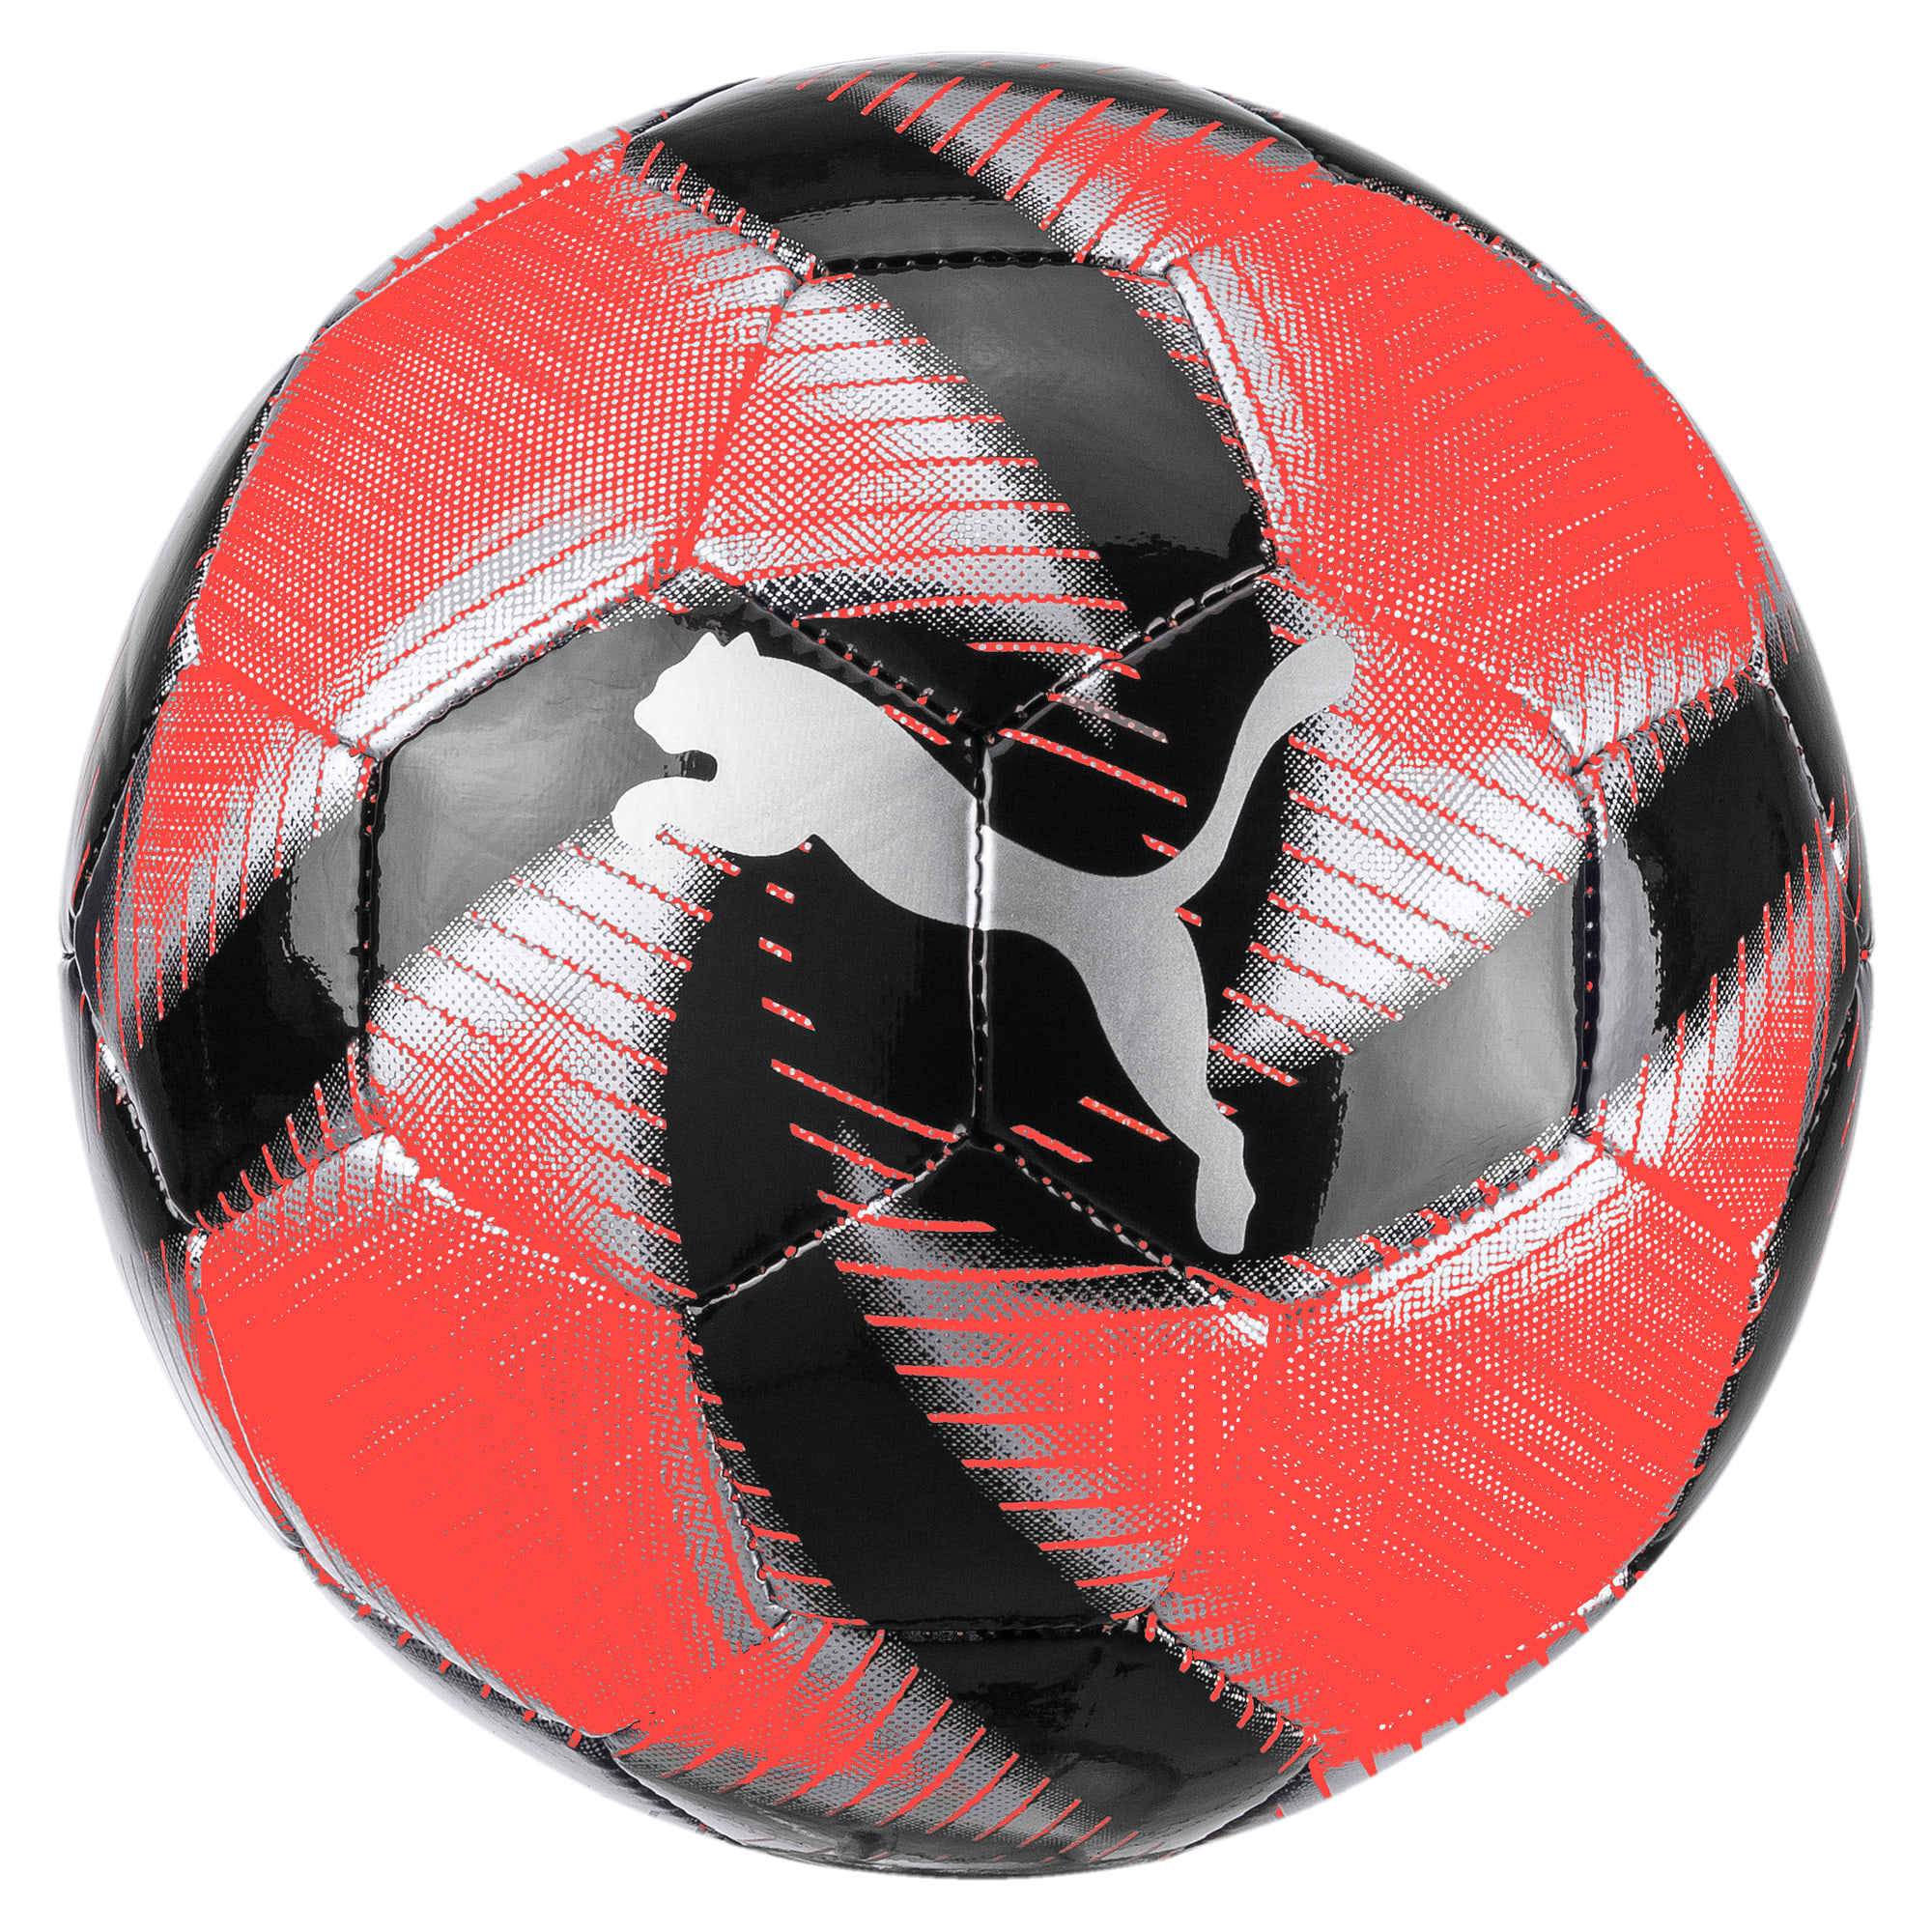 Thumbnail 1 of FUTURE Flare Mini Trainingsball, Nrgy Red-Asphalt-Black-White, medium